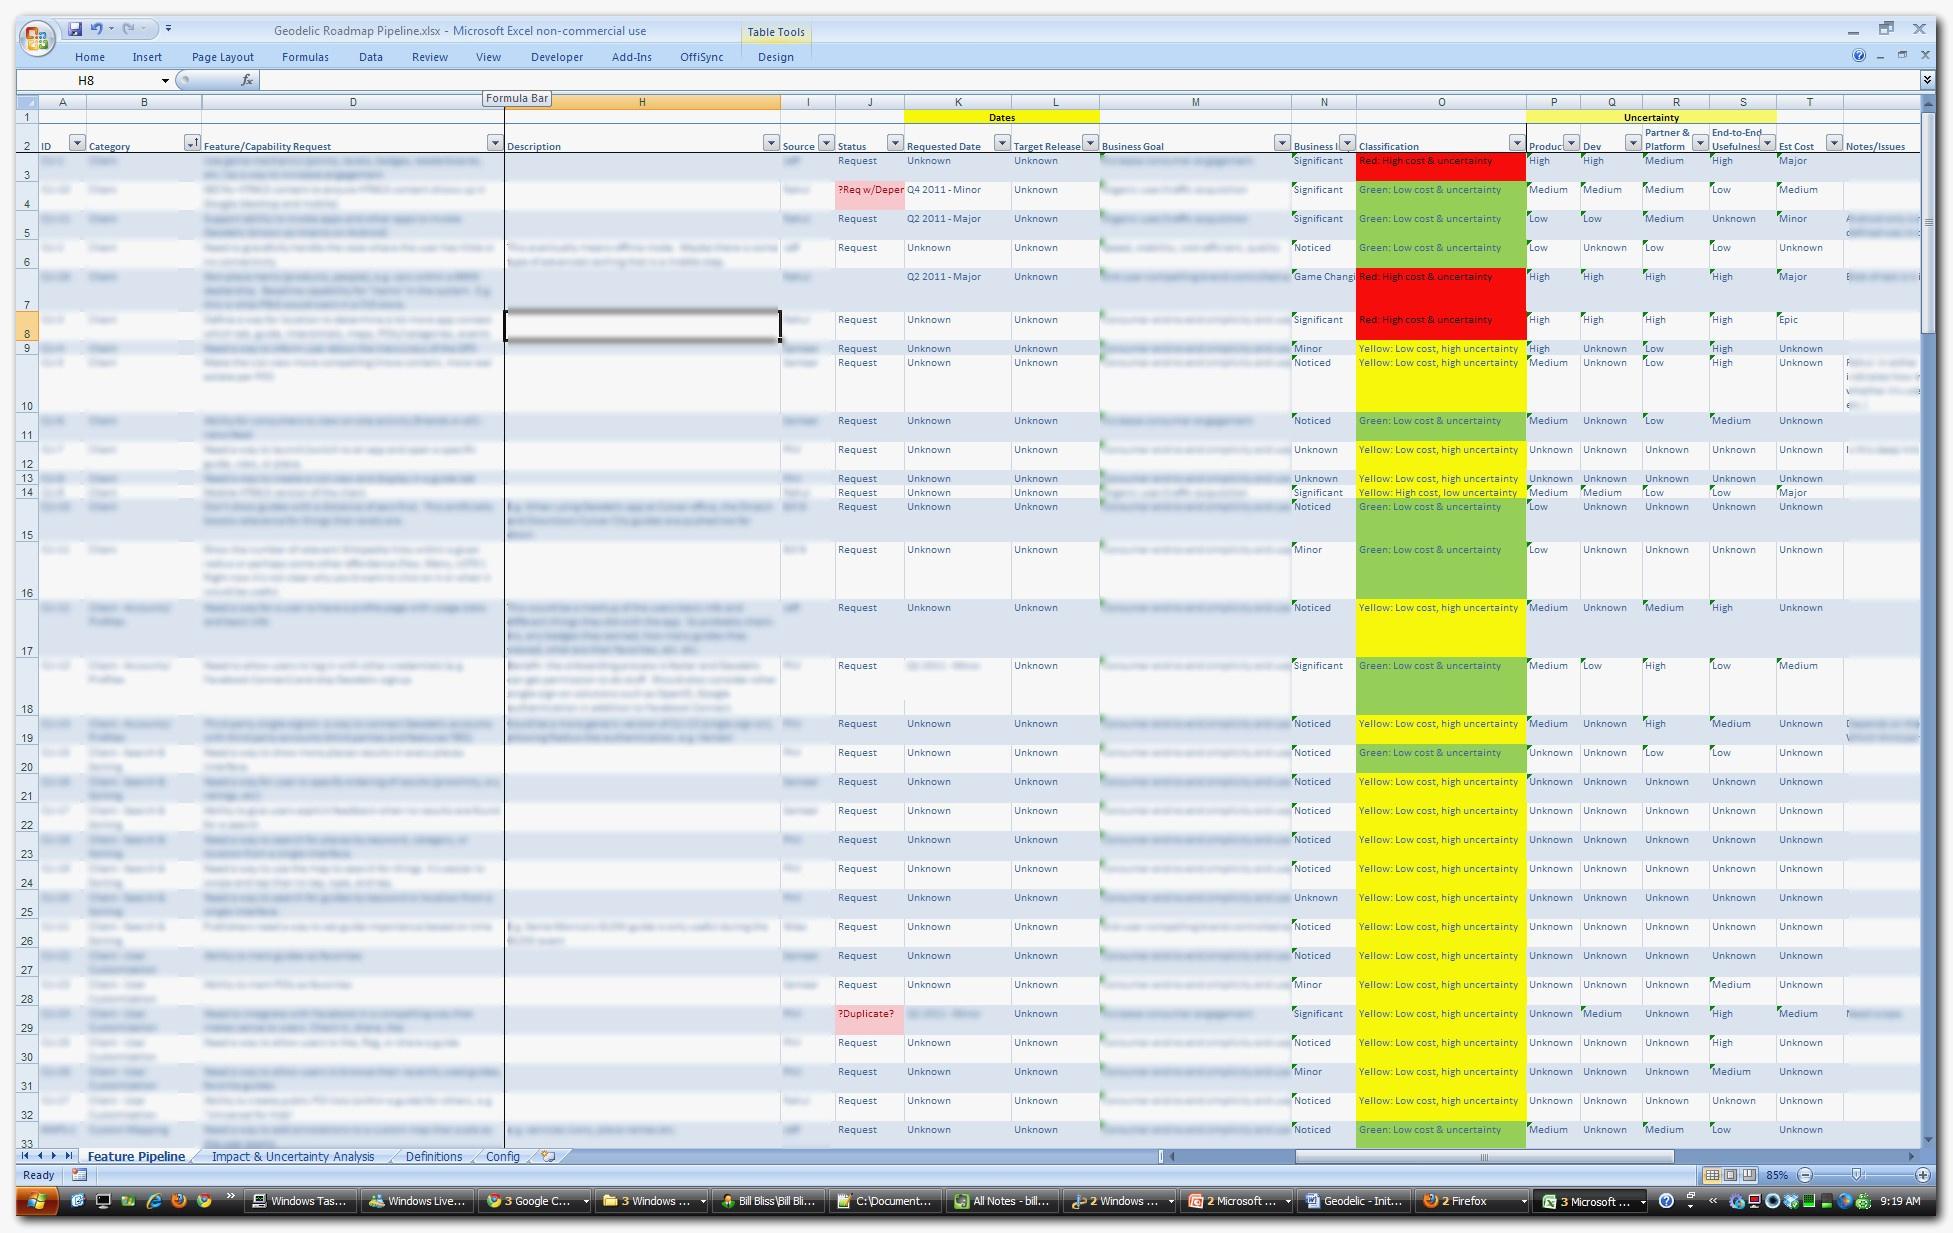 Roadmap Spreadsheet Pertaining To Roadmap Spreadsheet 2018 Excel Spreadsheet Google Spreadsheet